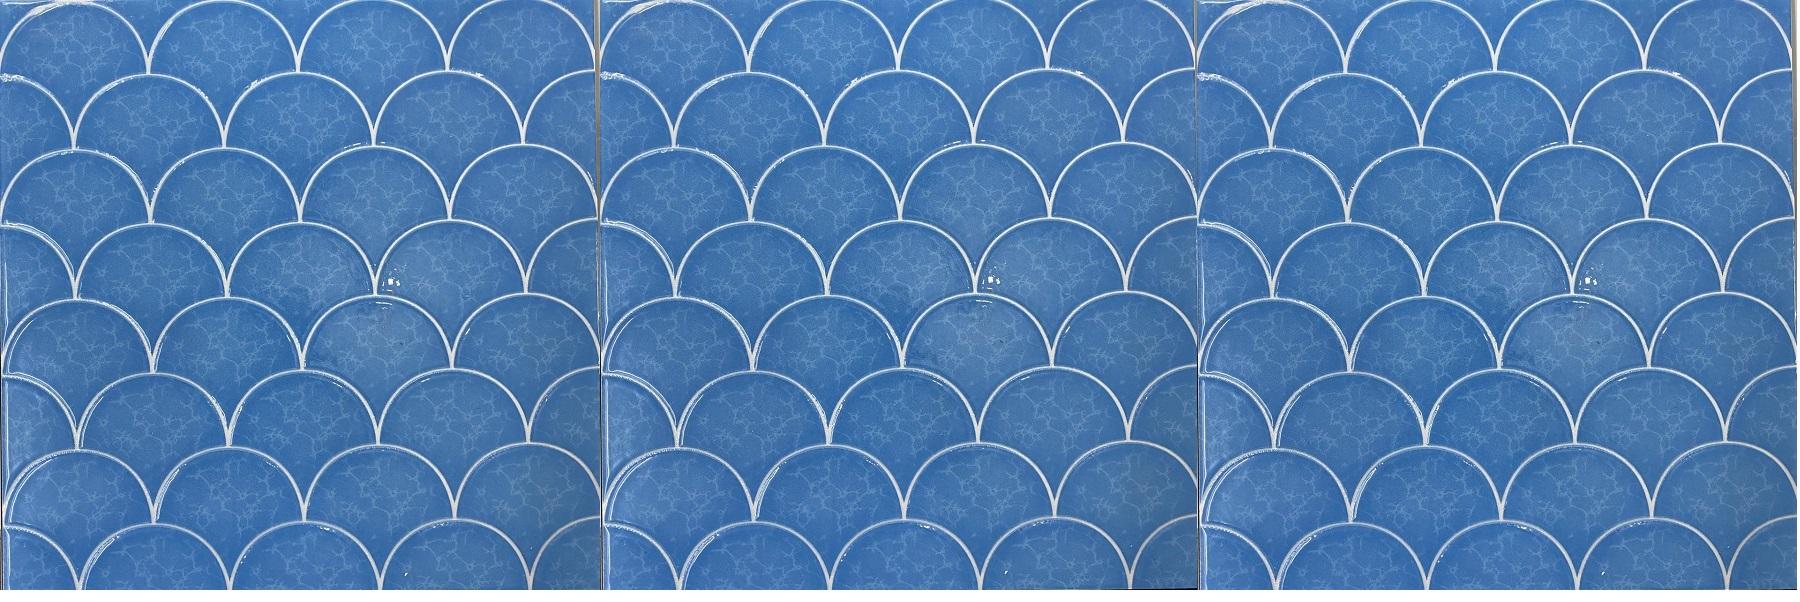 gach gia mosaic vay ca 30x30 cm mau xanh bien gia re